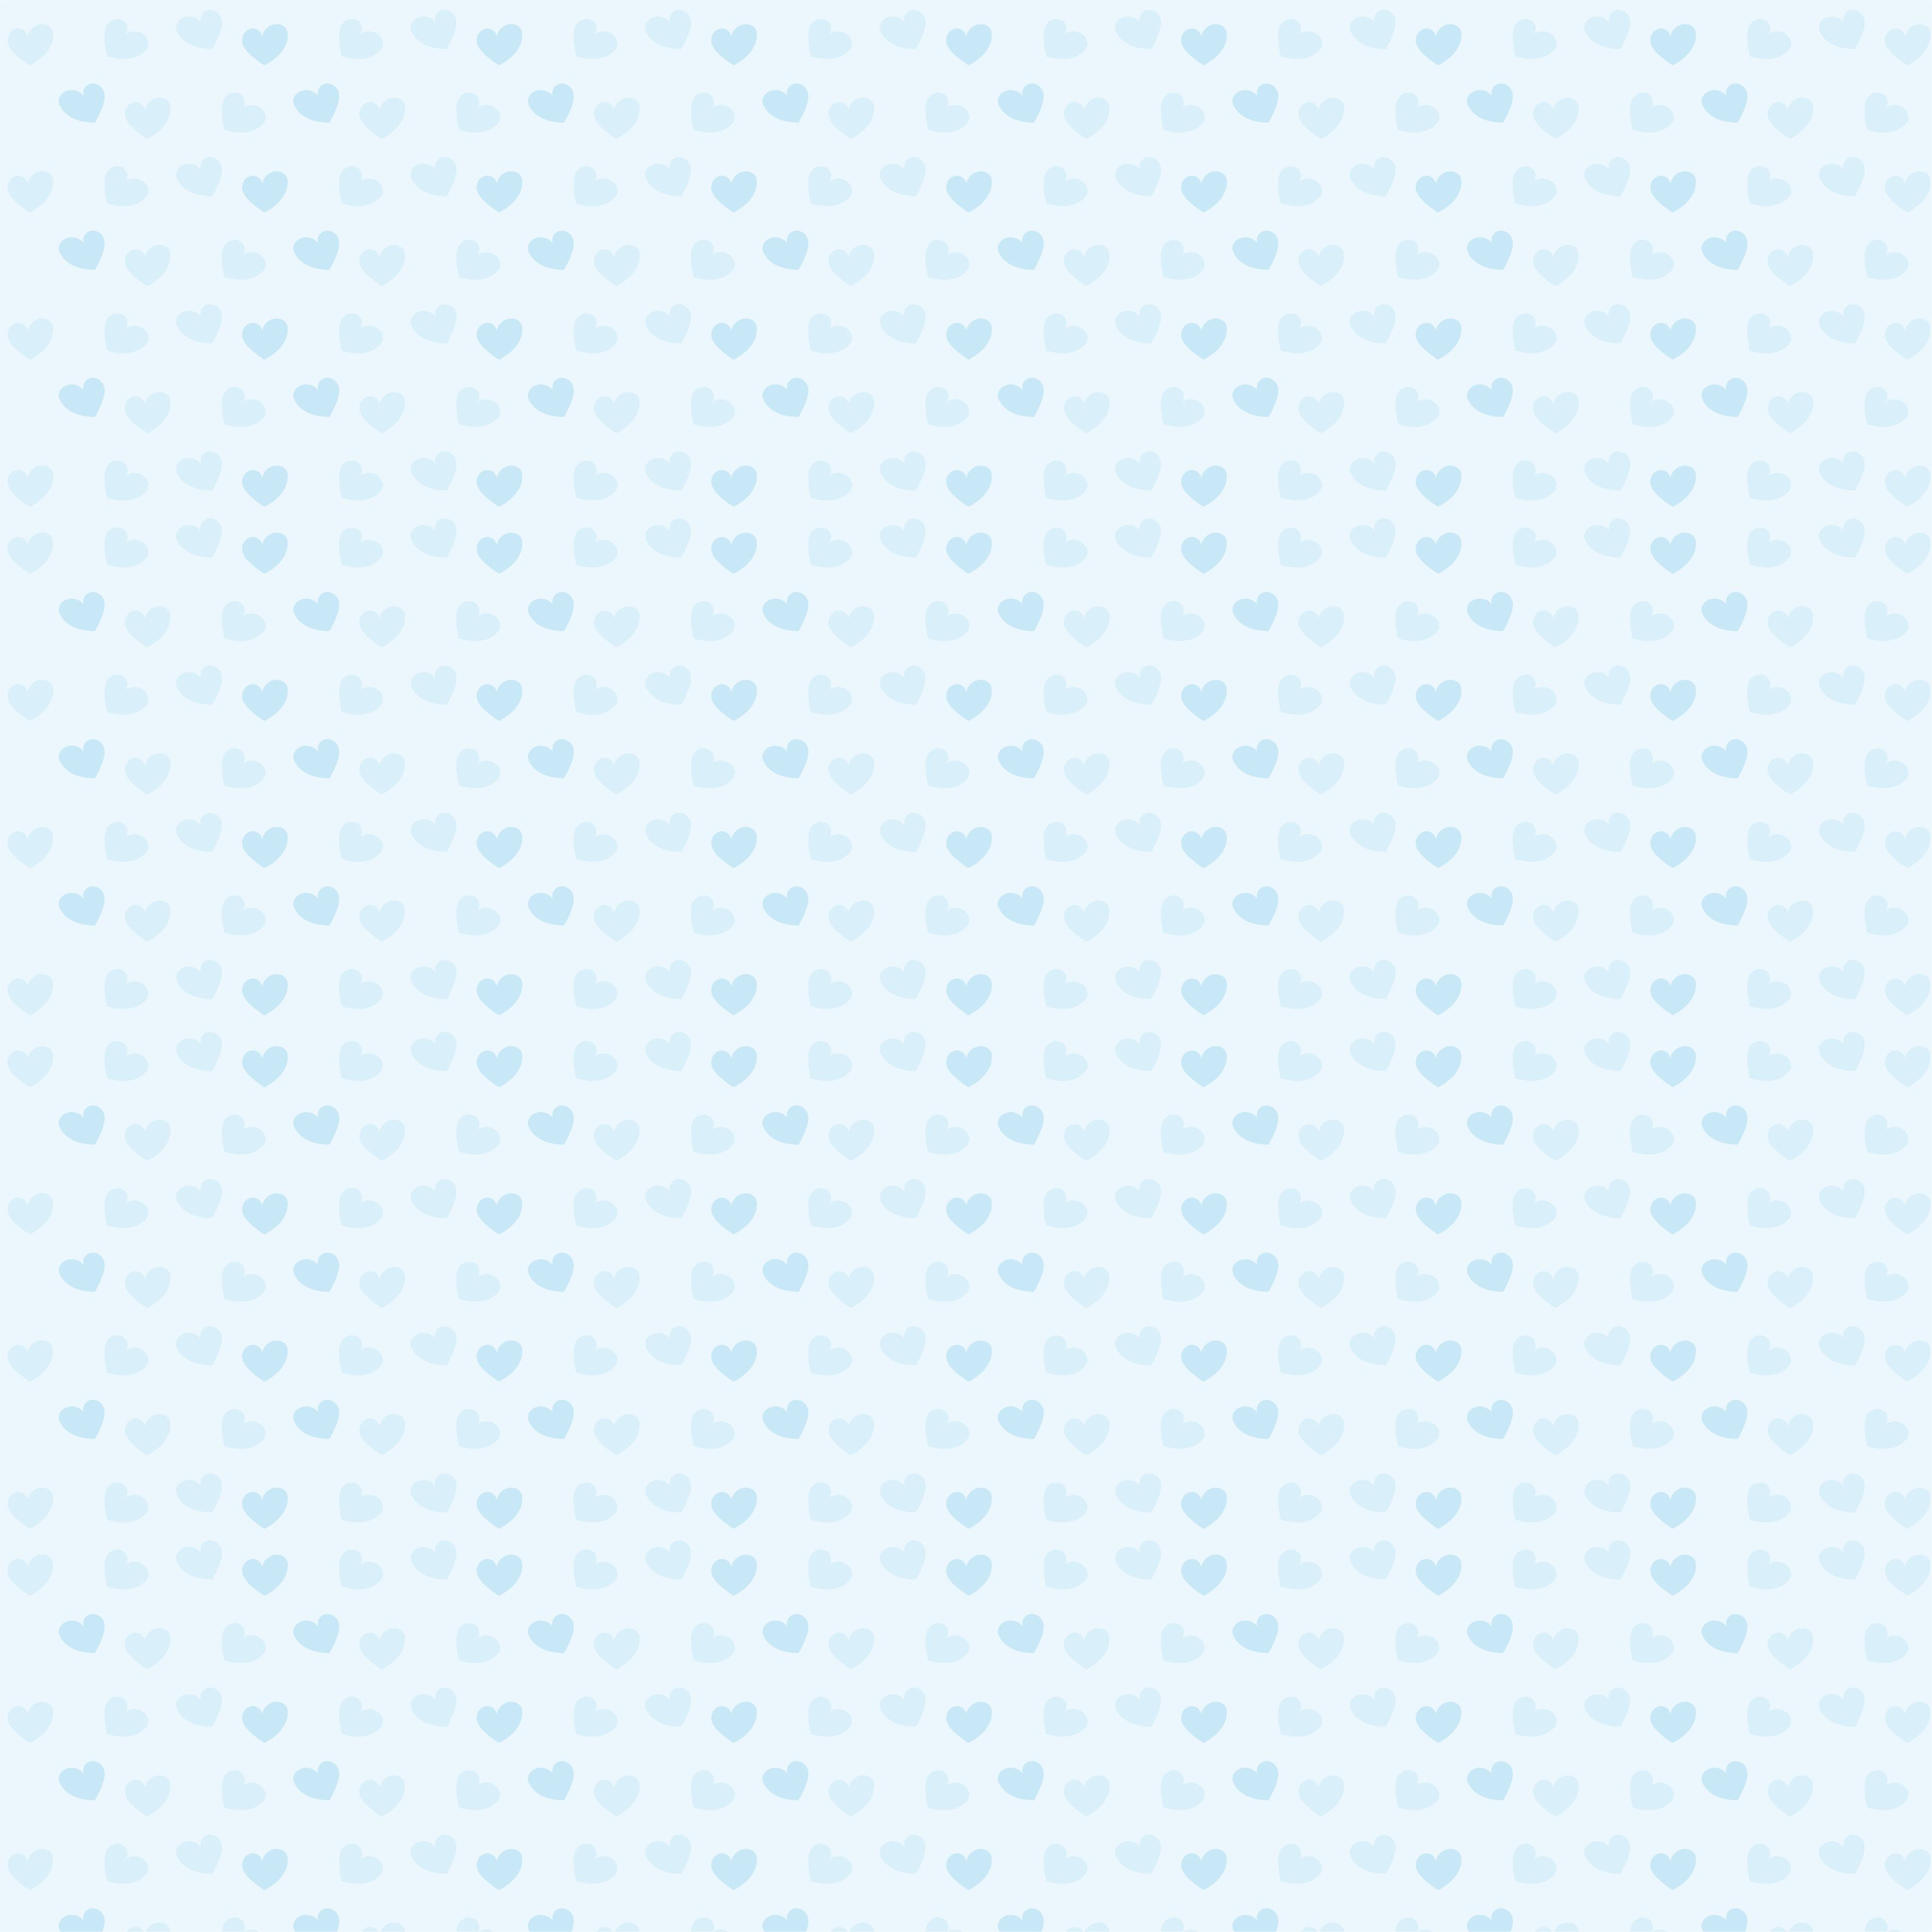 papel digital chuva de amor menina 6